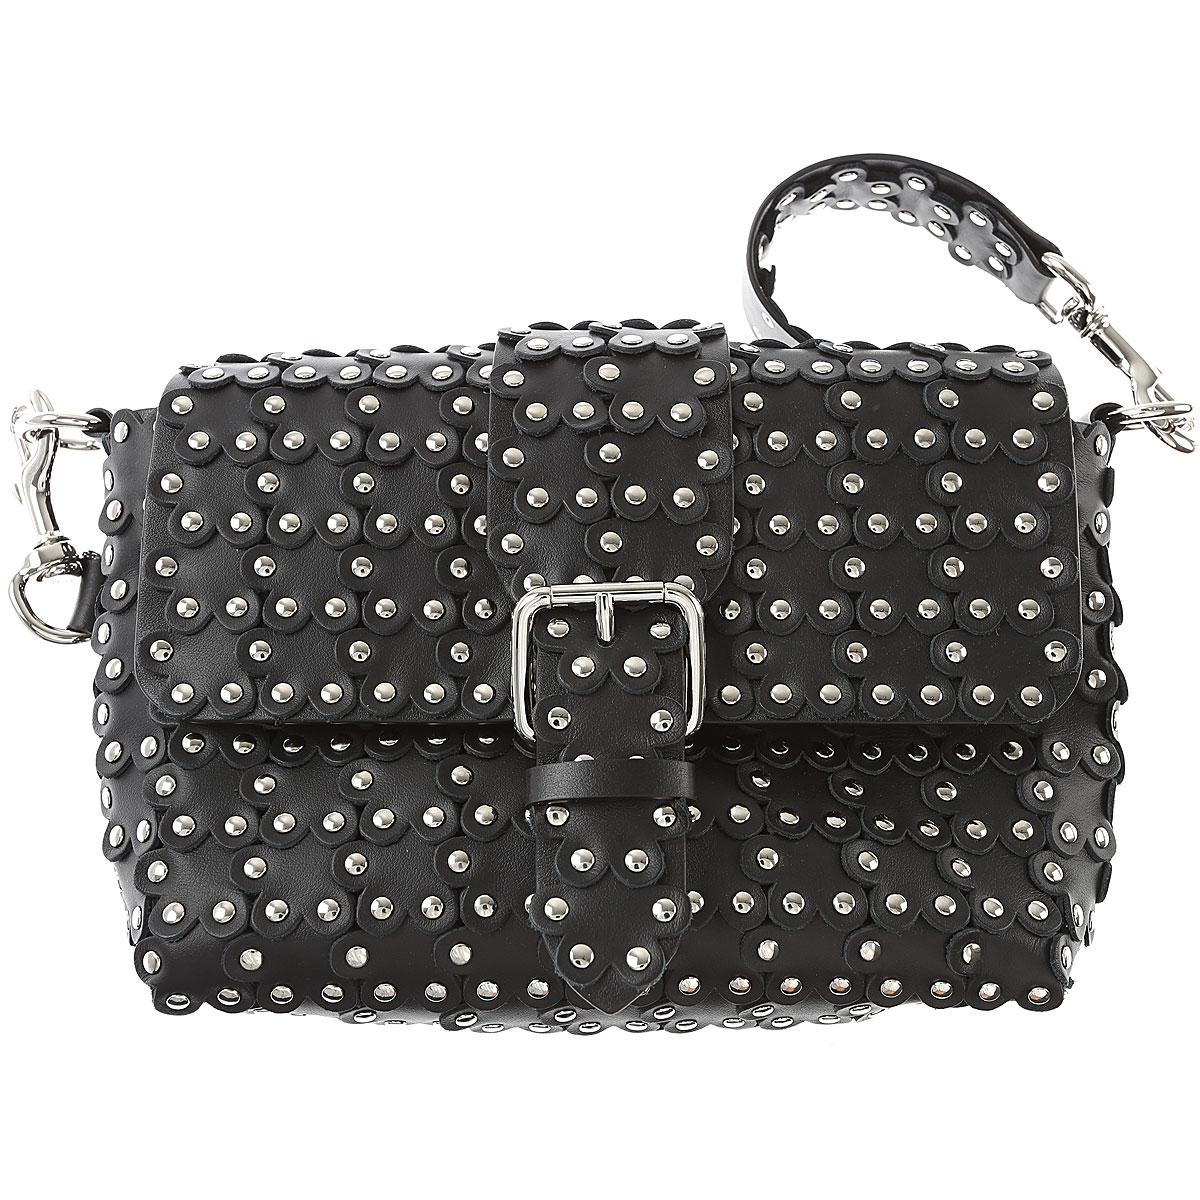 Valentino Shoulder Bag for Women, Red Valentino, Black, Leather, 2017 USA-456012